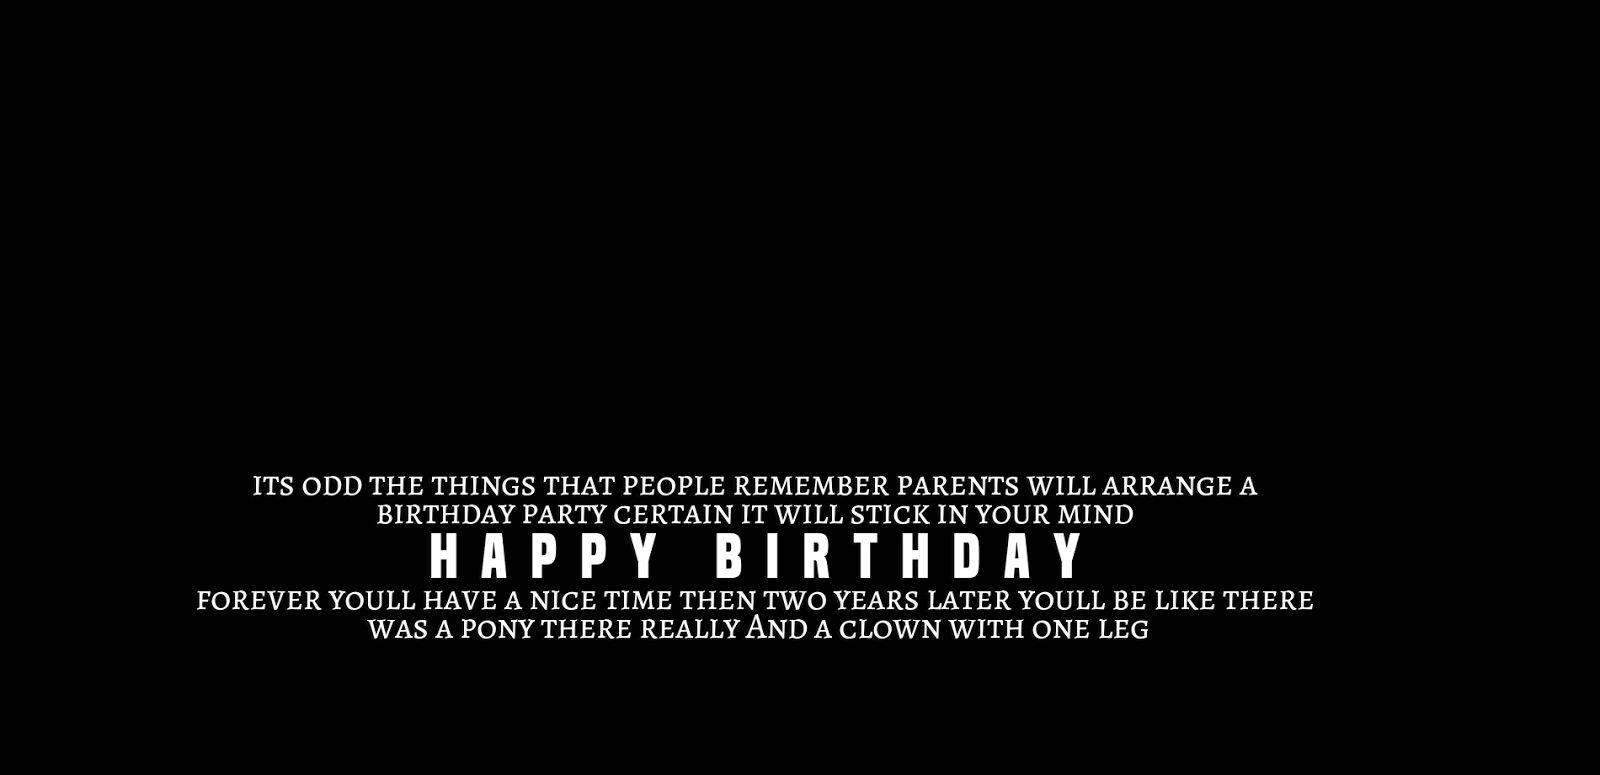 Pin By Iqra Mari Editz On Png S Happy Birthday Png Happy Birthday Text Birthday Text